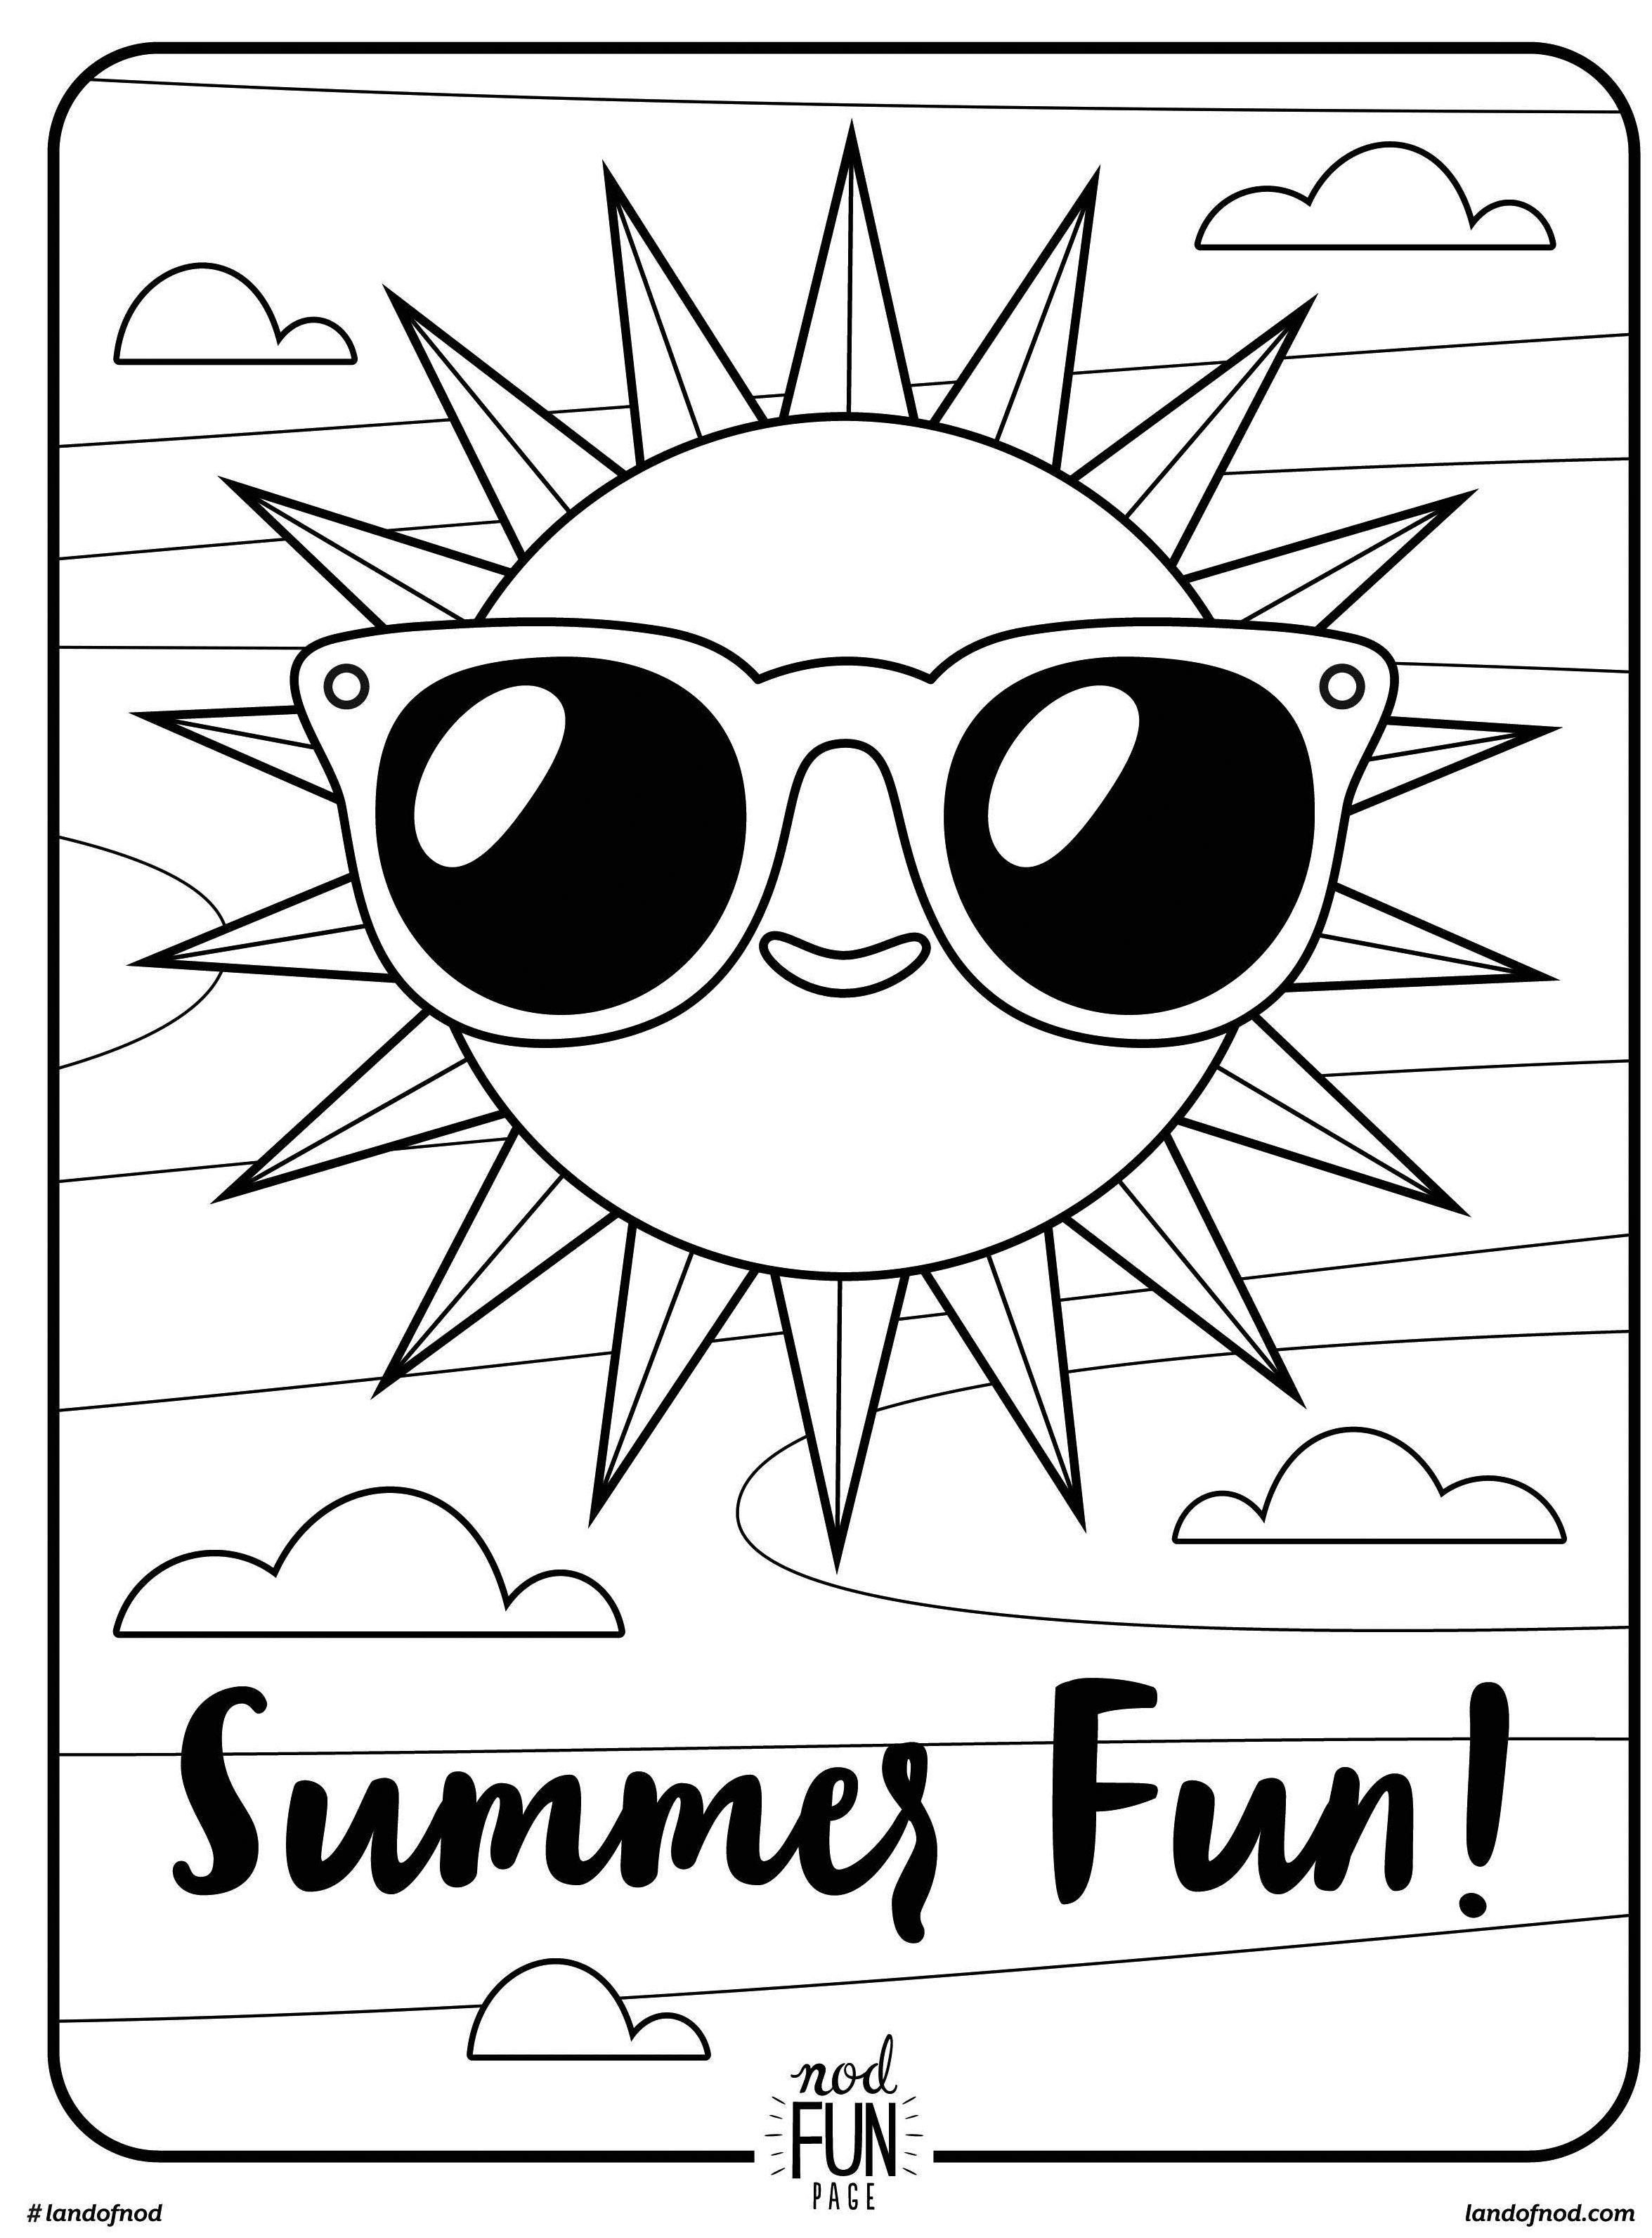 Free Printable Coloring Page: Summer Fun | Summer | Pinterest - Summer Coloring Sheets Free Printable